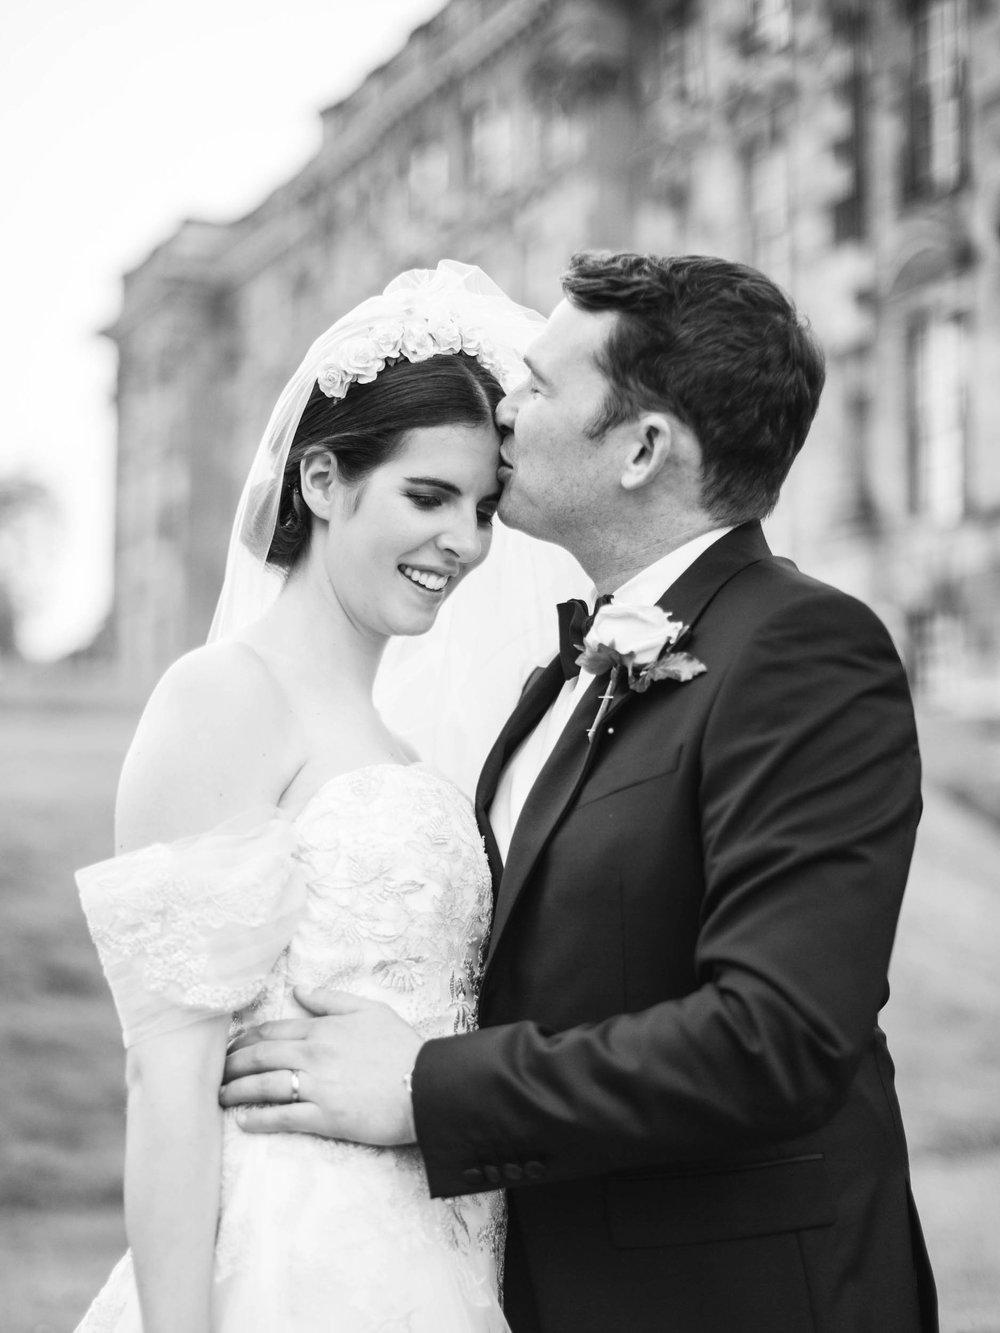 Amy O'Boyle Photography- Destination & UK Fine Art Film Wedding Photographer- Stoneleigh Abbey Wedding-55.jpg